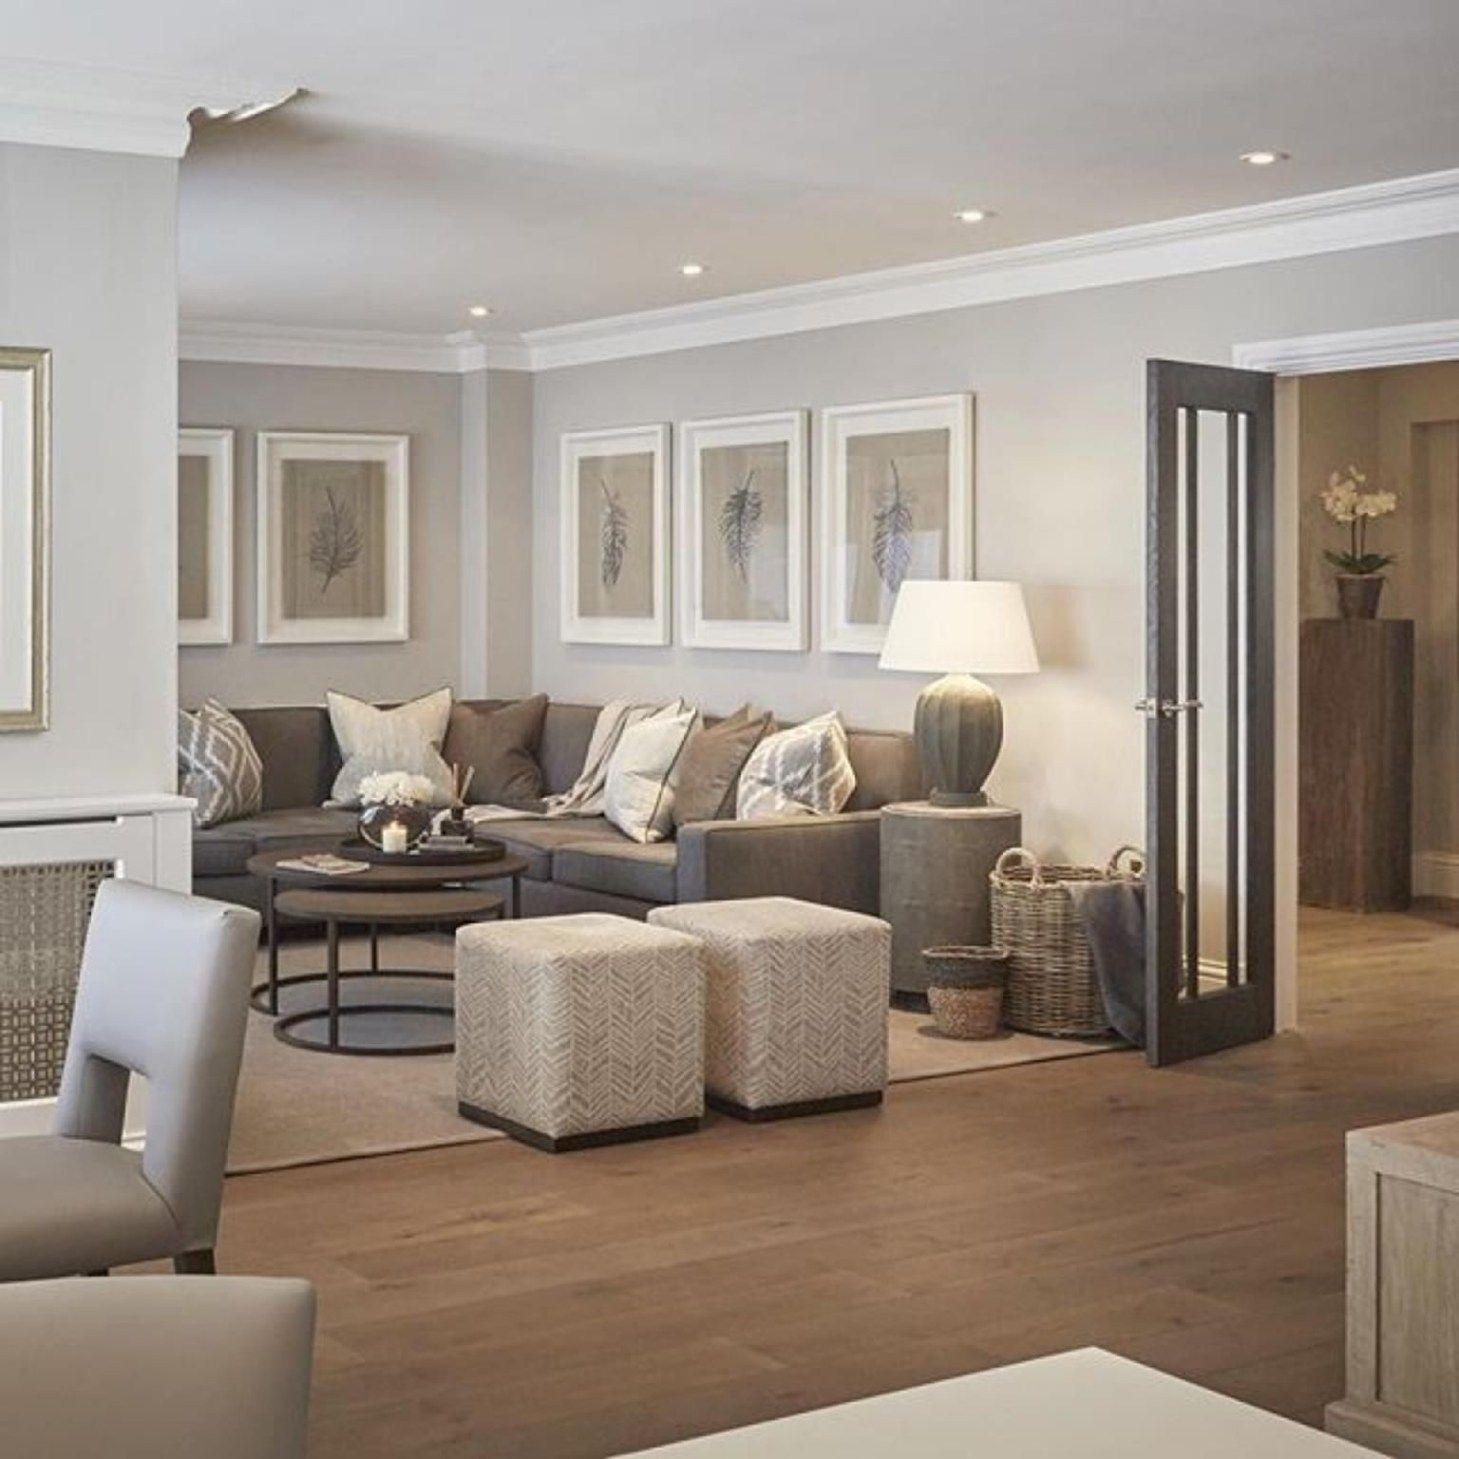 Home Design Ideas Classy: 54 Elegant And Attractive Living Room Design Ideas